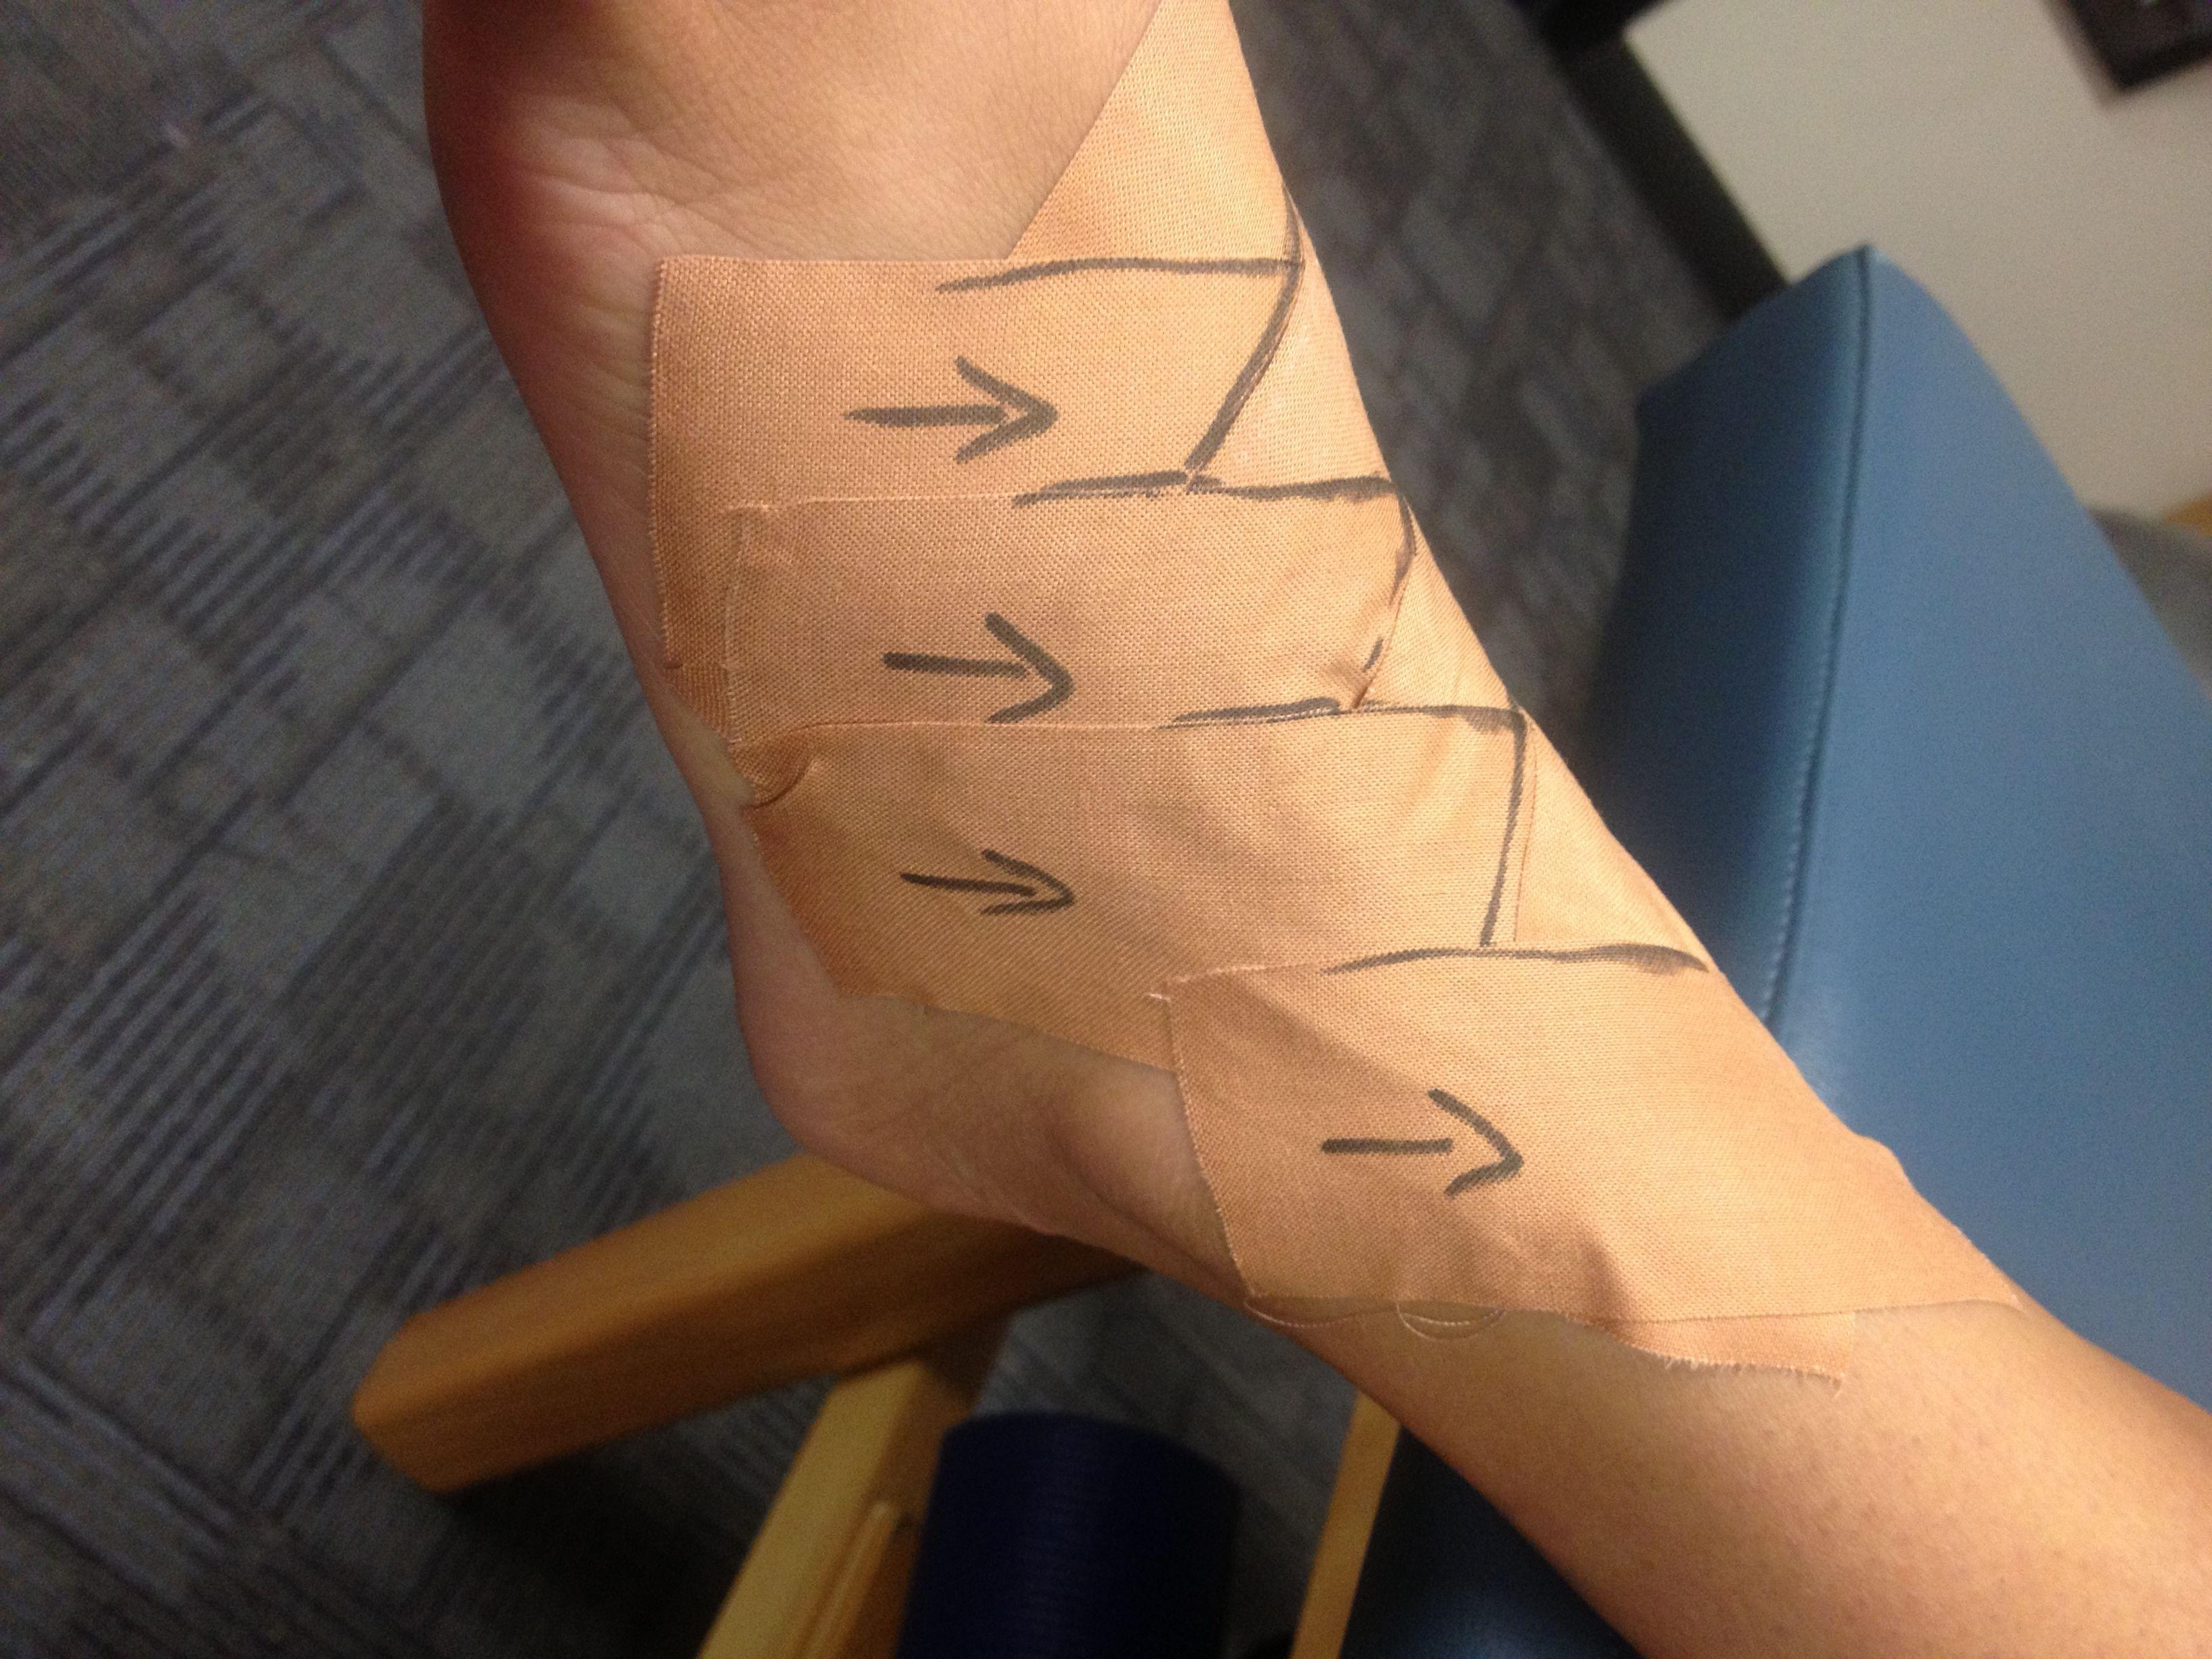 Herringbone tape pattern for midfoot sprain or Lisfanc injury ...